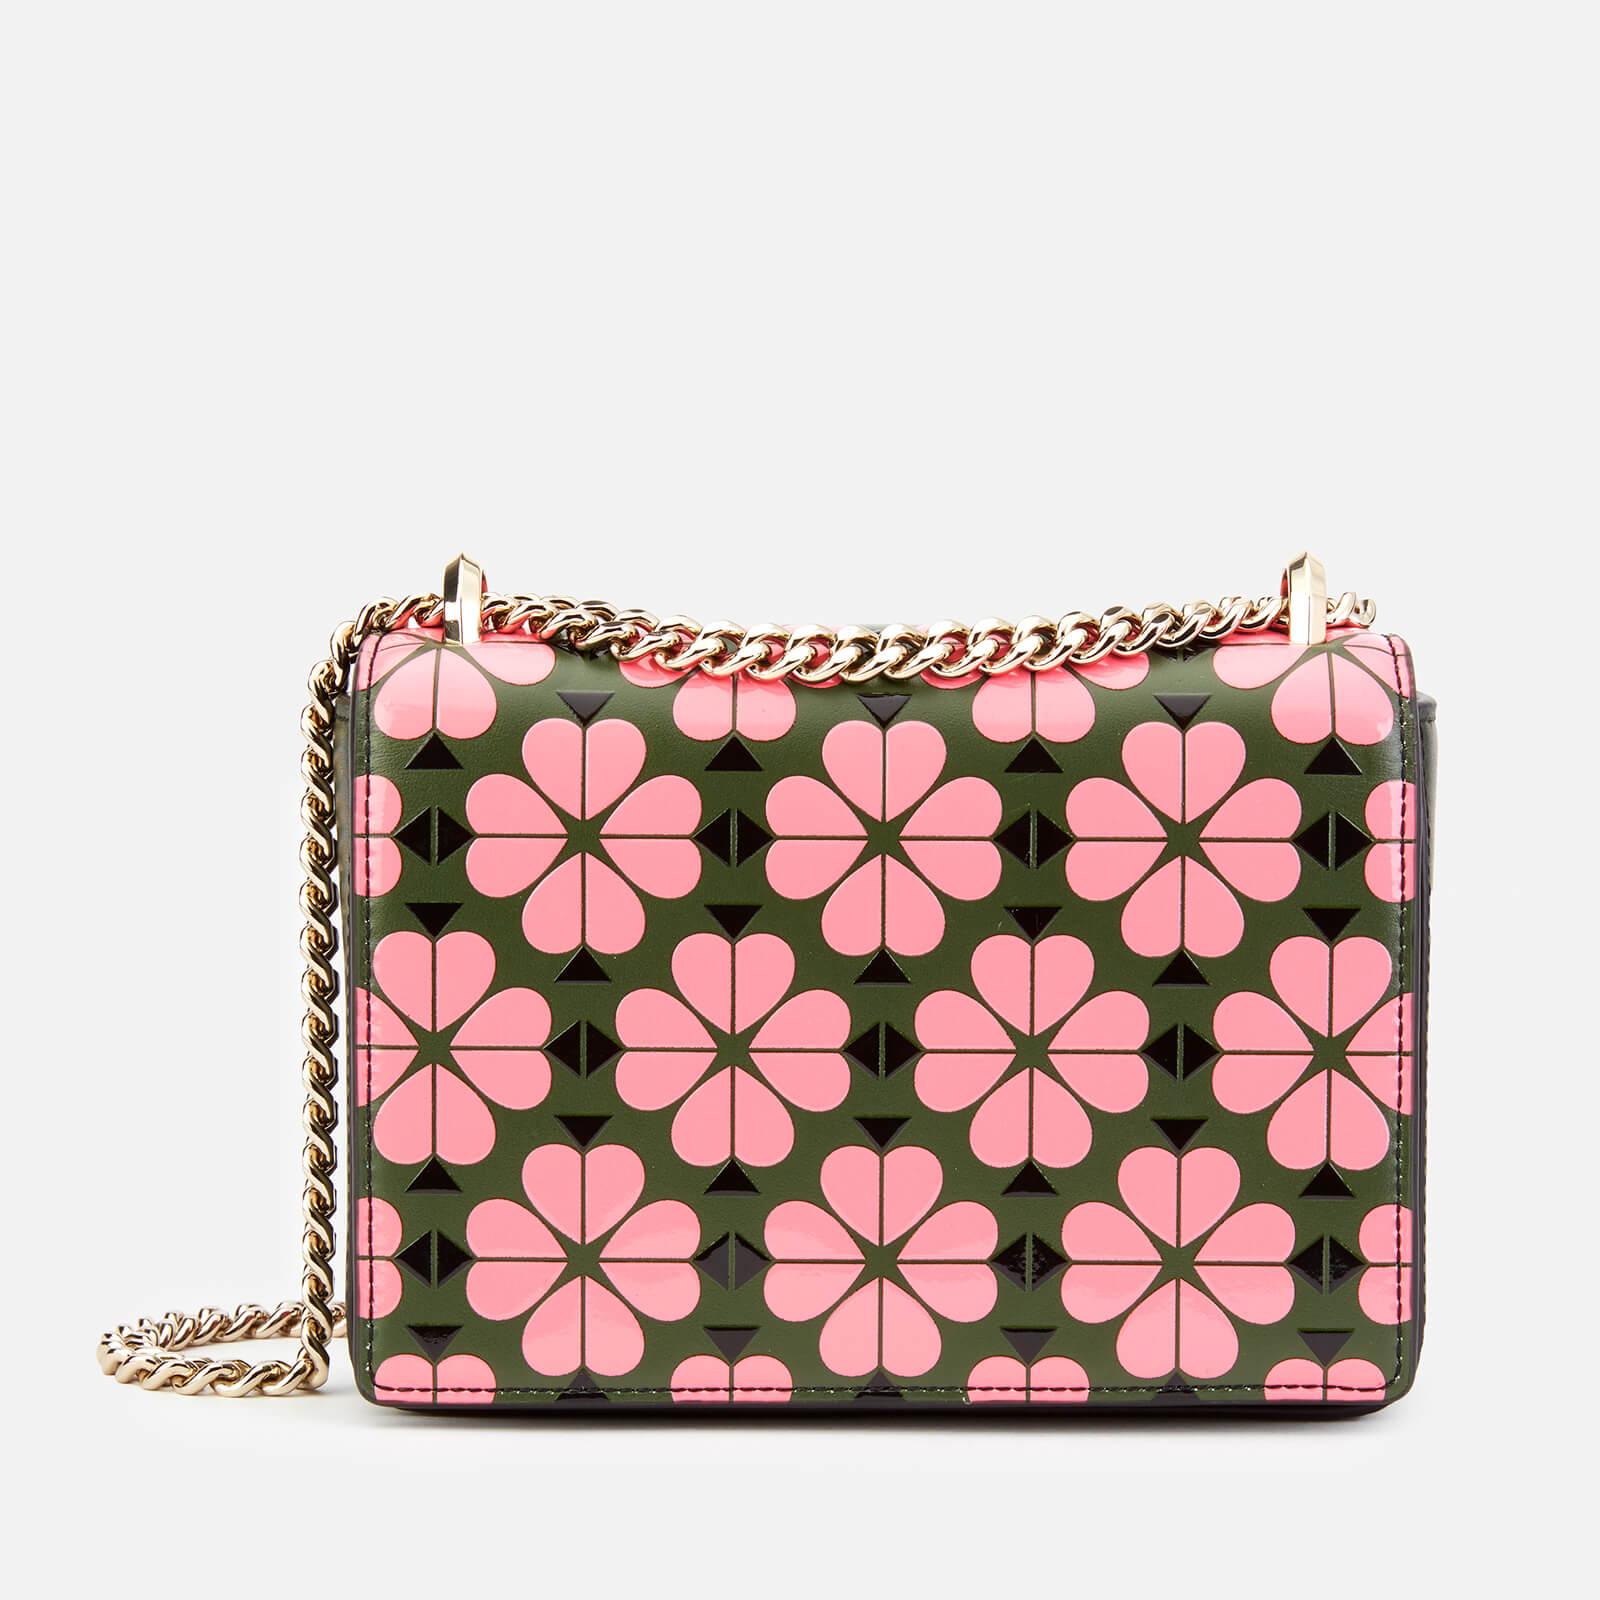 Kate Spade New York Women S Amelia Flower Small Shoulder Bag Bright Pink Multi